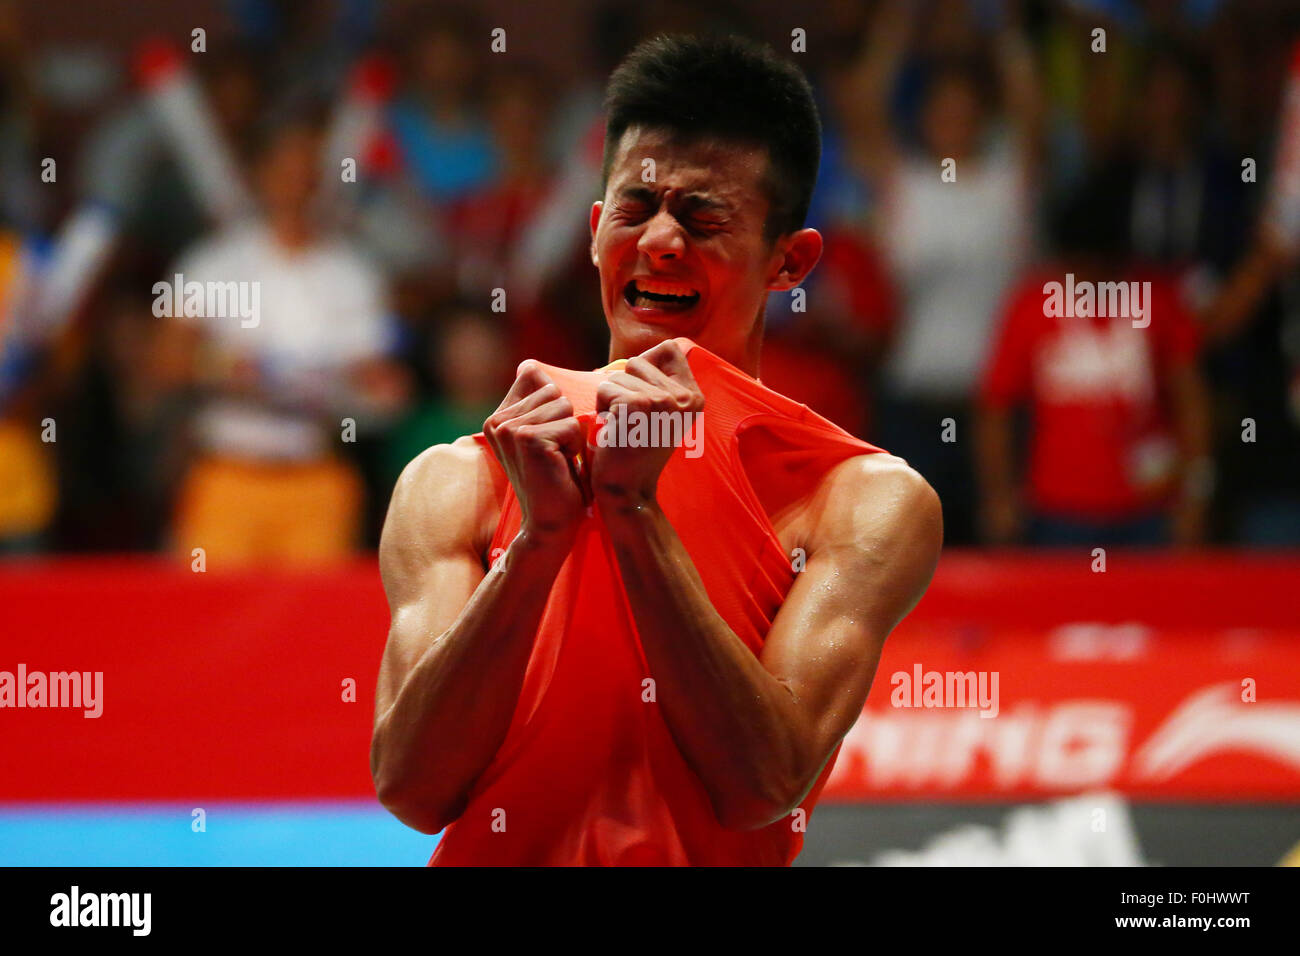 Istora Senayan Arena, Jakarta, Indonésie. Août 16, 2015. Chen Long (RCS), le 16 août 2015 - TOTAL: Photo Stock